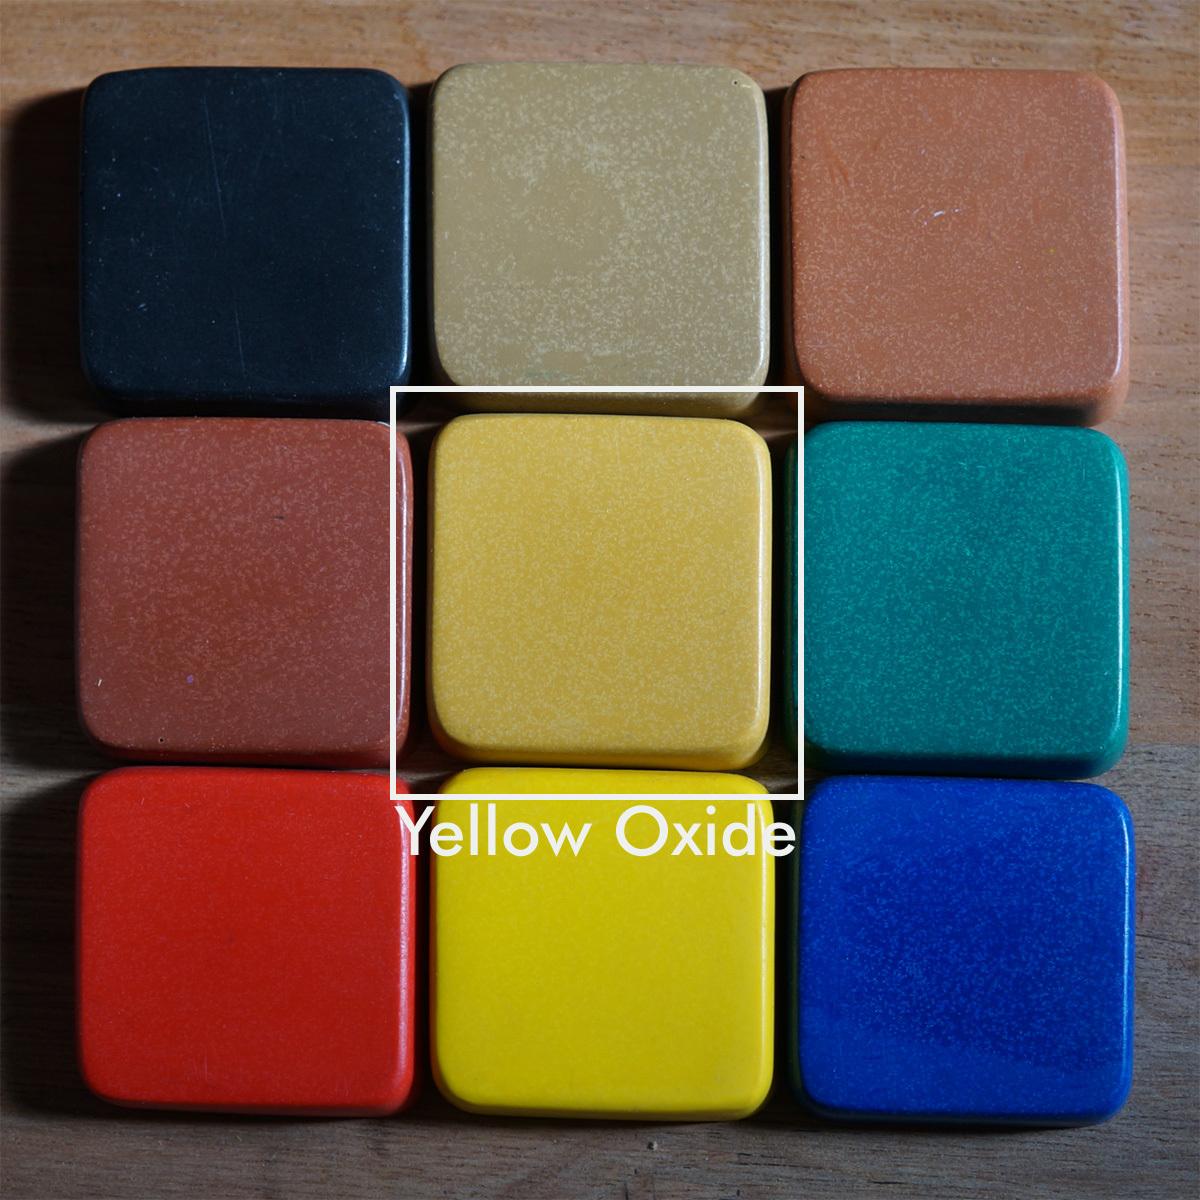 PIGMENT YELLOW OXIDE 1kg(着色剤:イエローオキソイド 1kg) - 画像2